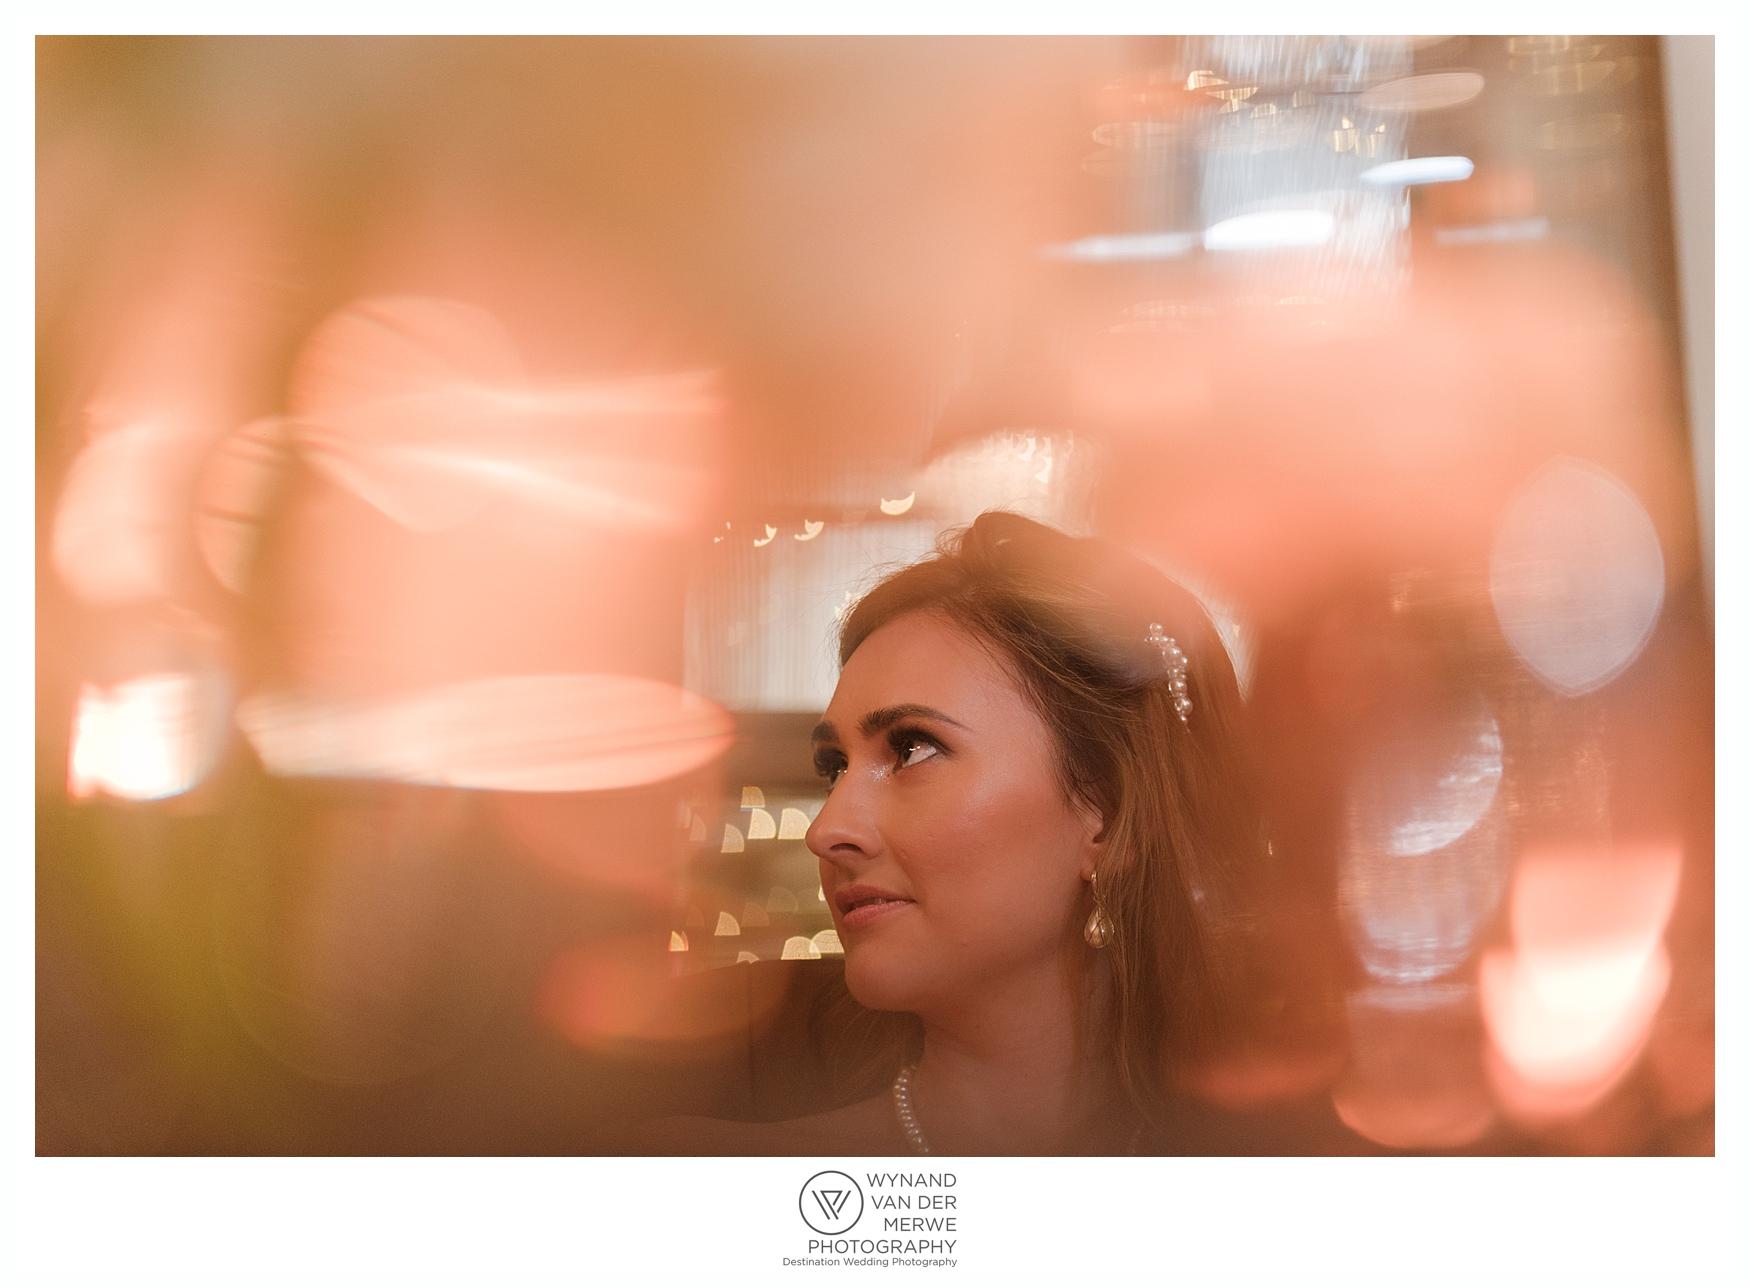 Wynandvandermerwe ryan natalia wedding photography cradle valley guesthouse gauteng-561.jpg